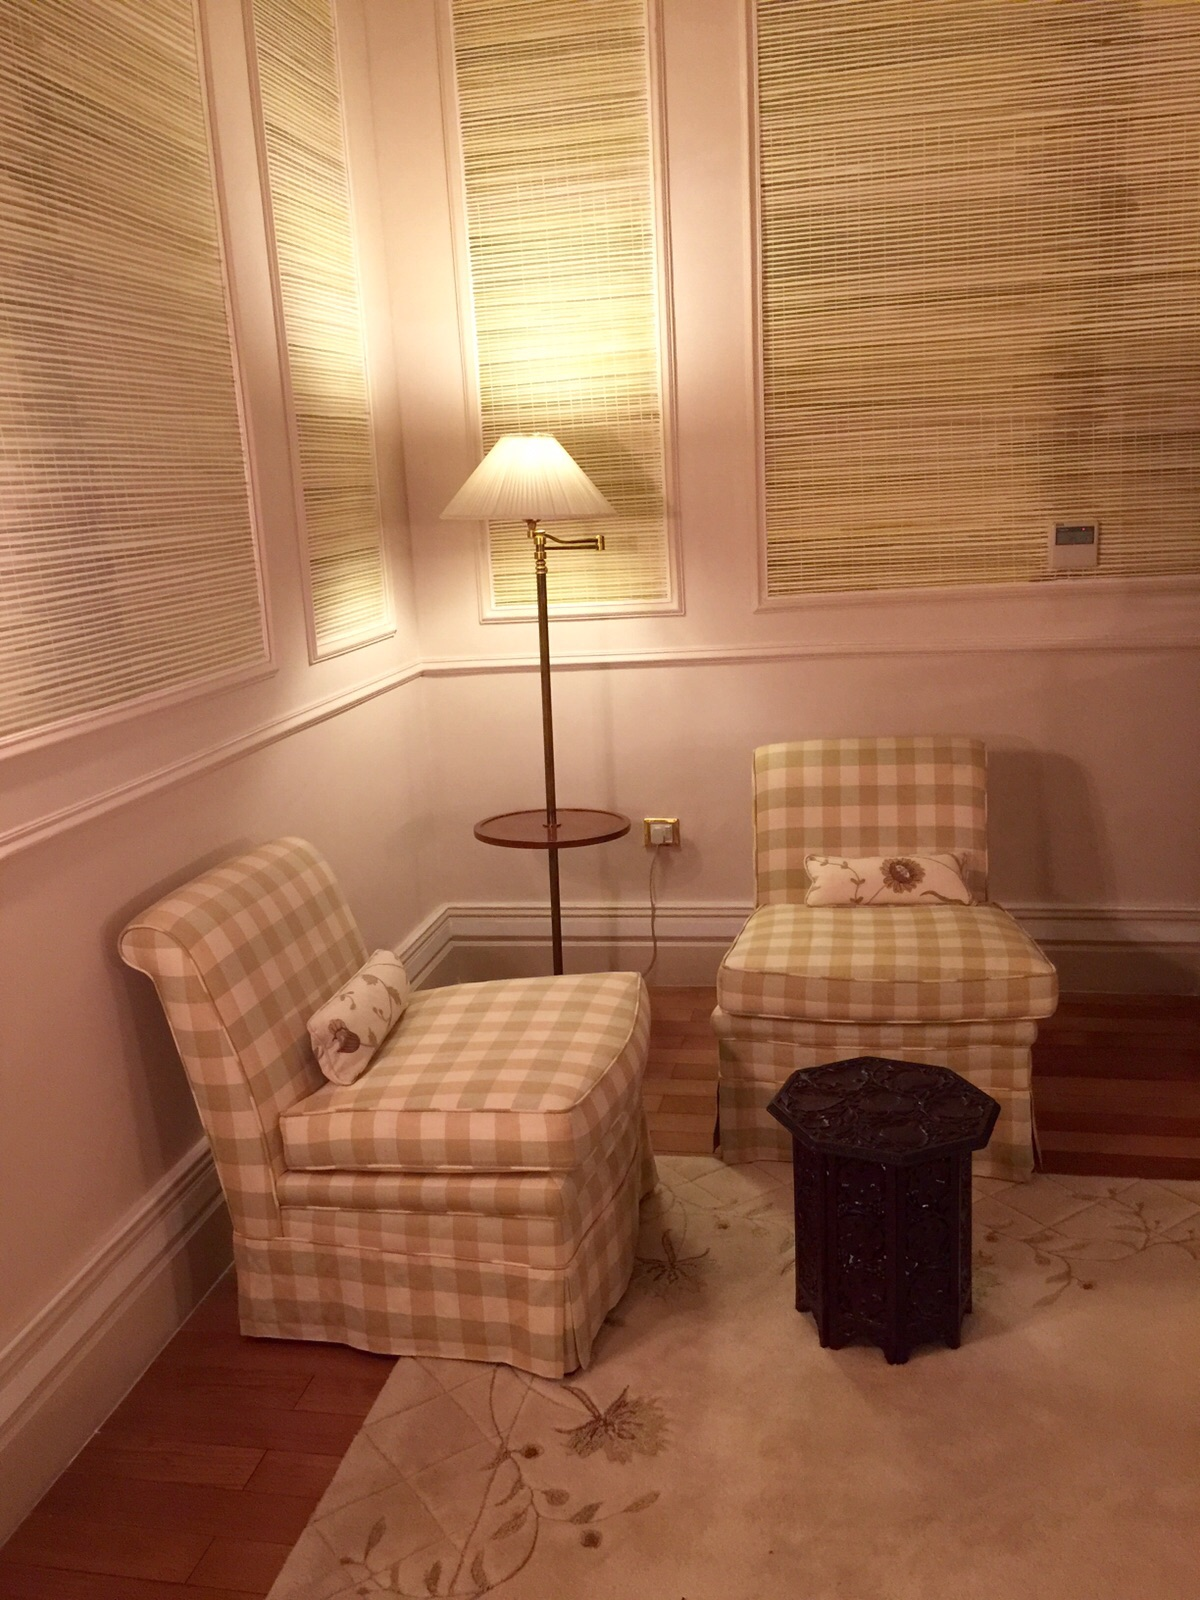 interior taj falaknuma, luxury hotel Hyderabad, luxury palace hyderabad, Taj Falaknuma Palace Hyderabad, taj hotel hyderabad,